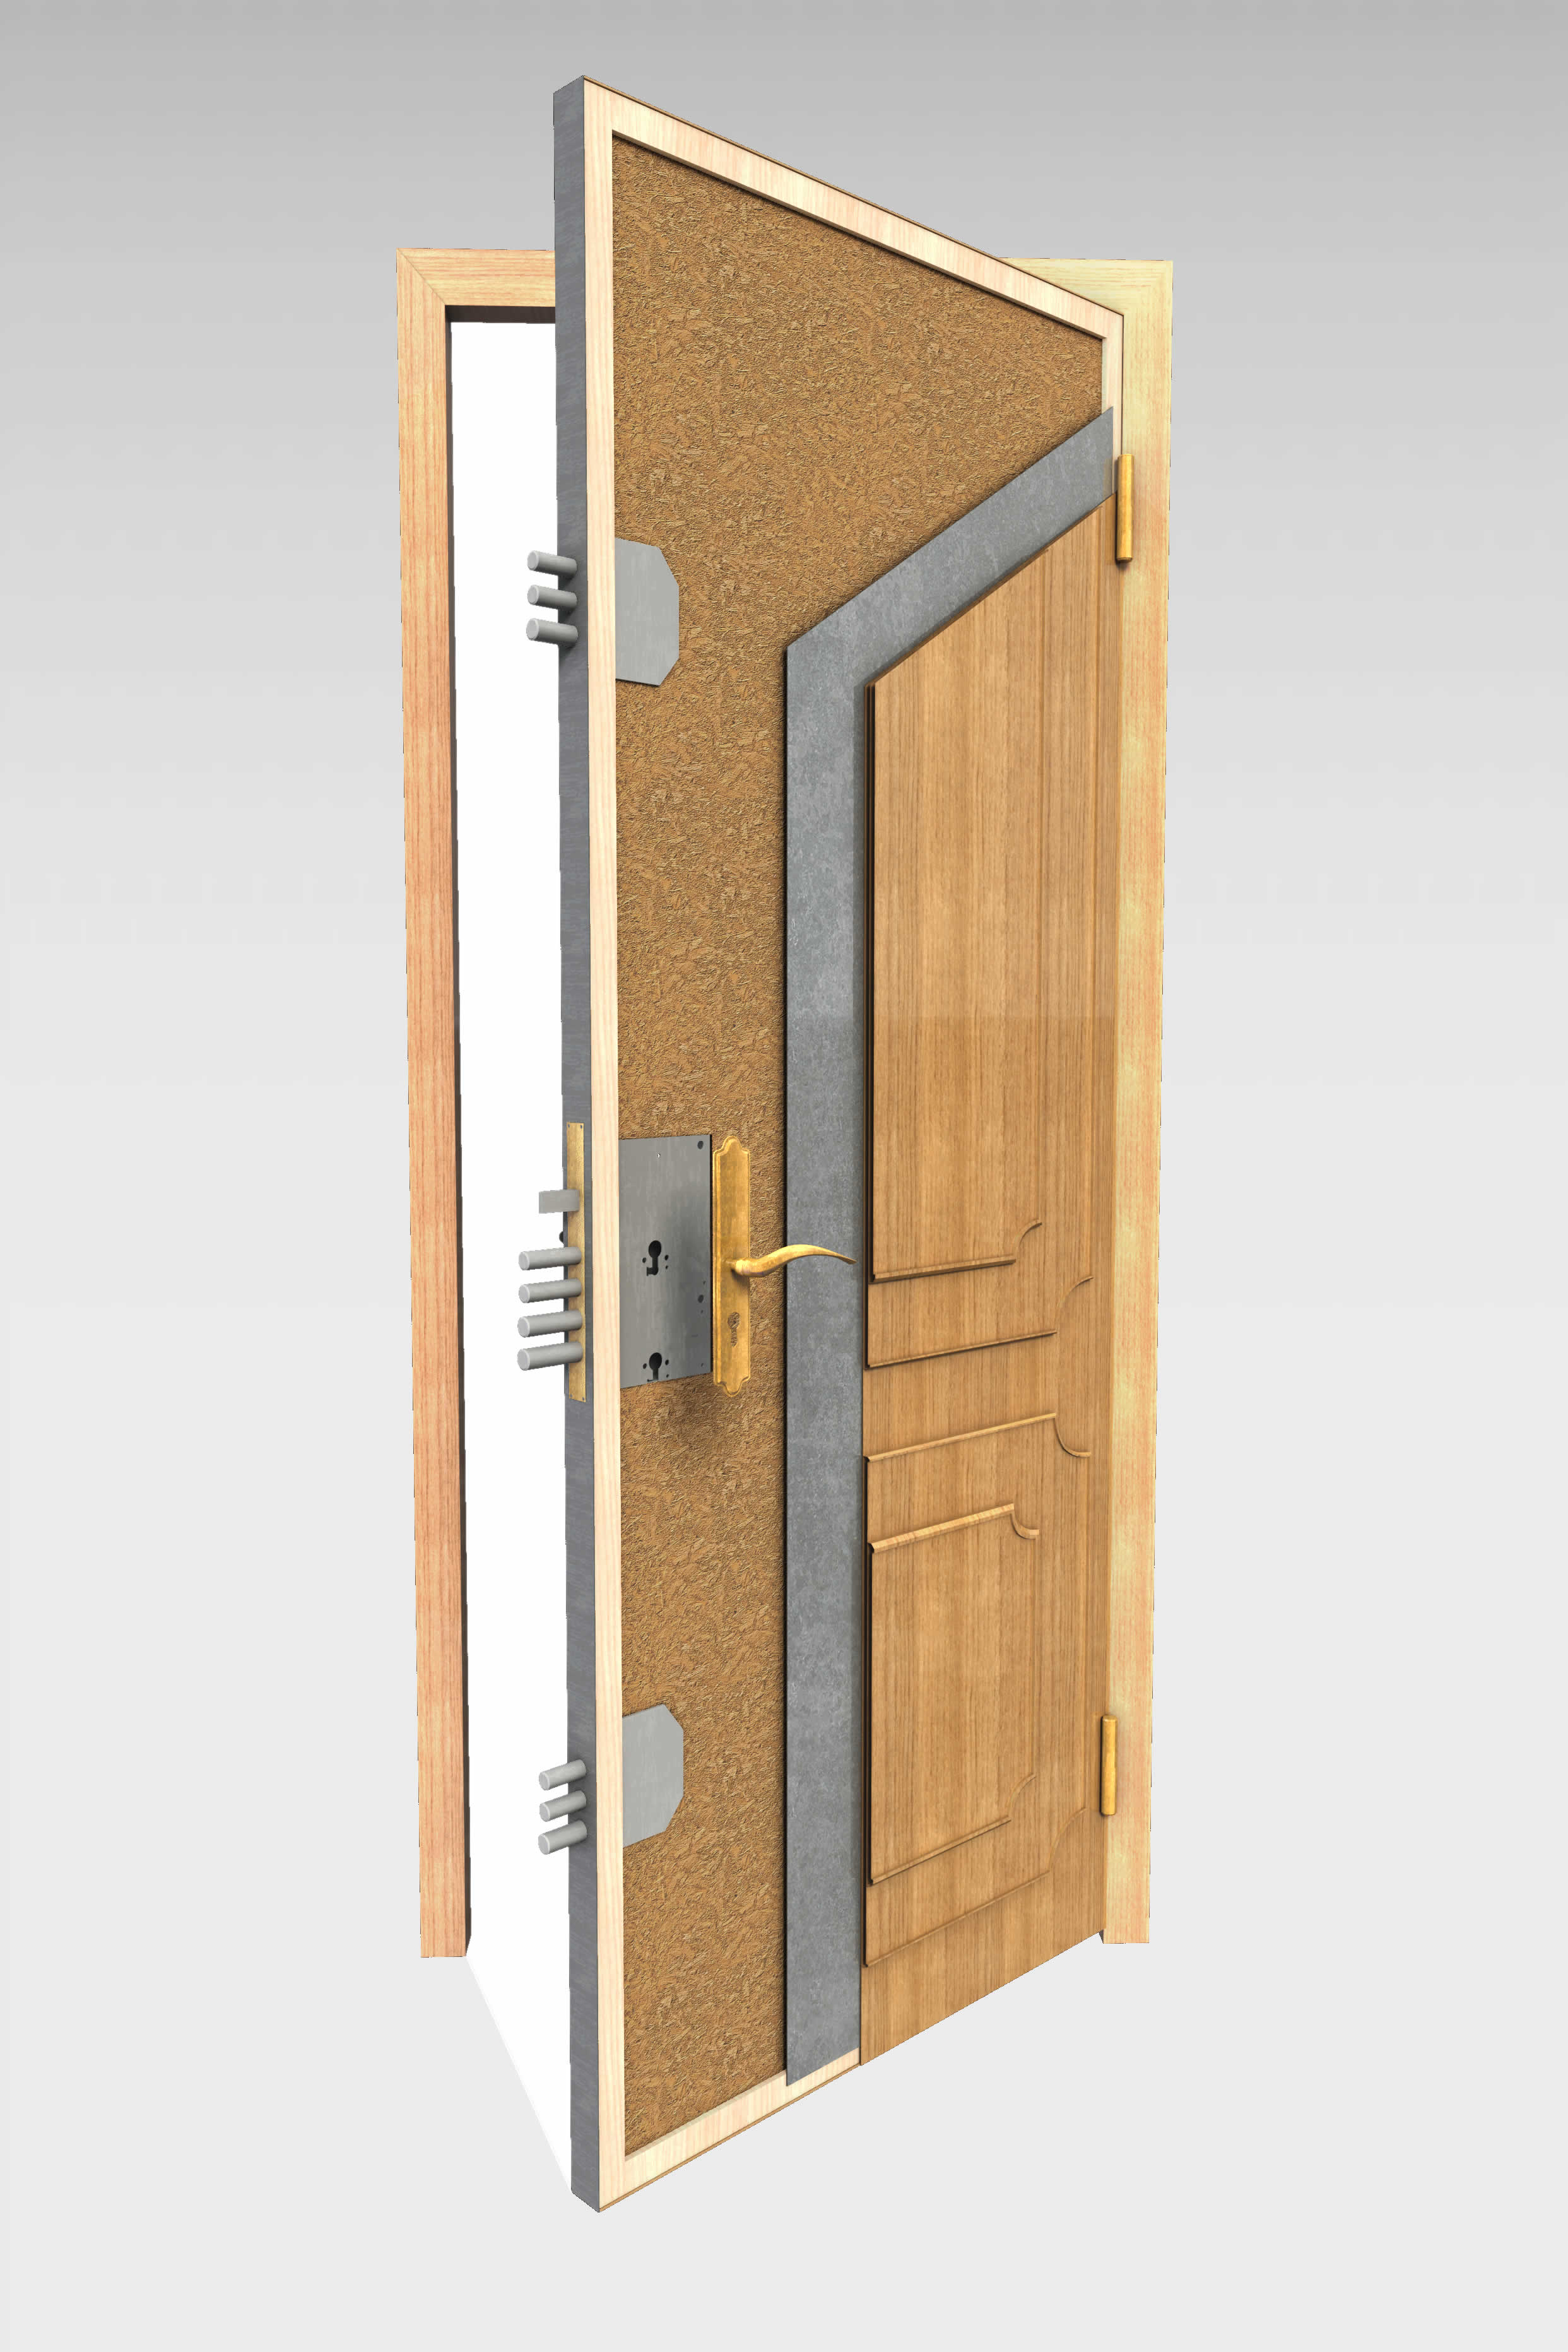 Puerta blindada b 10 roconsa - Cerraduras puertas blindadas ...